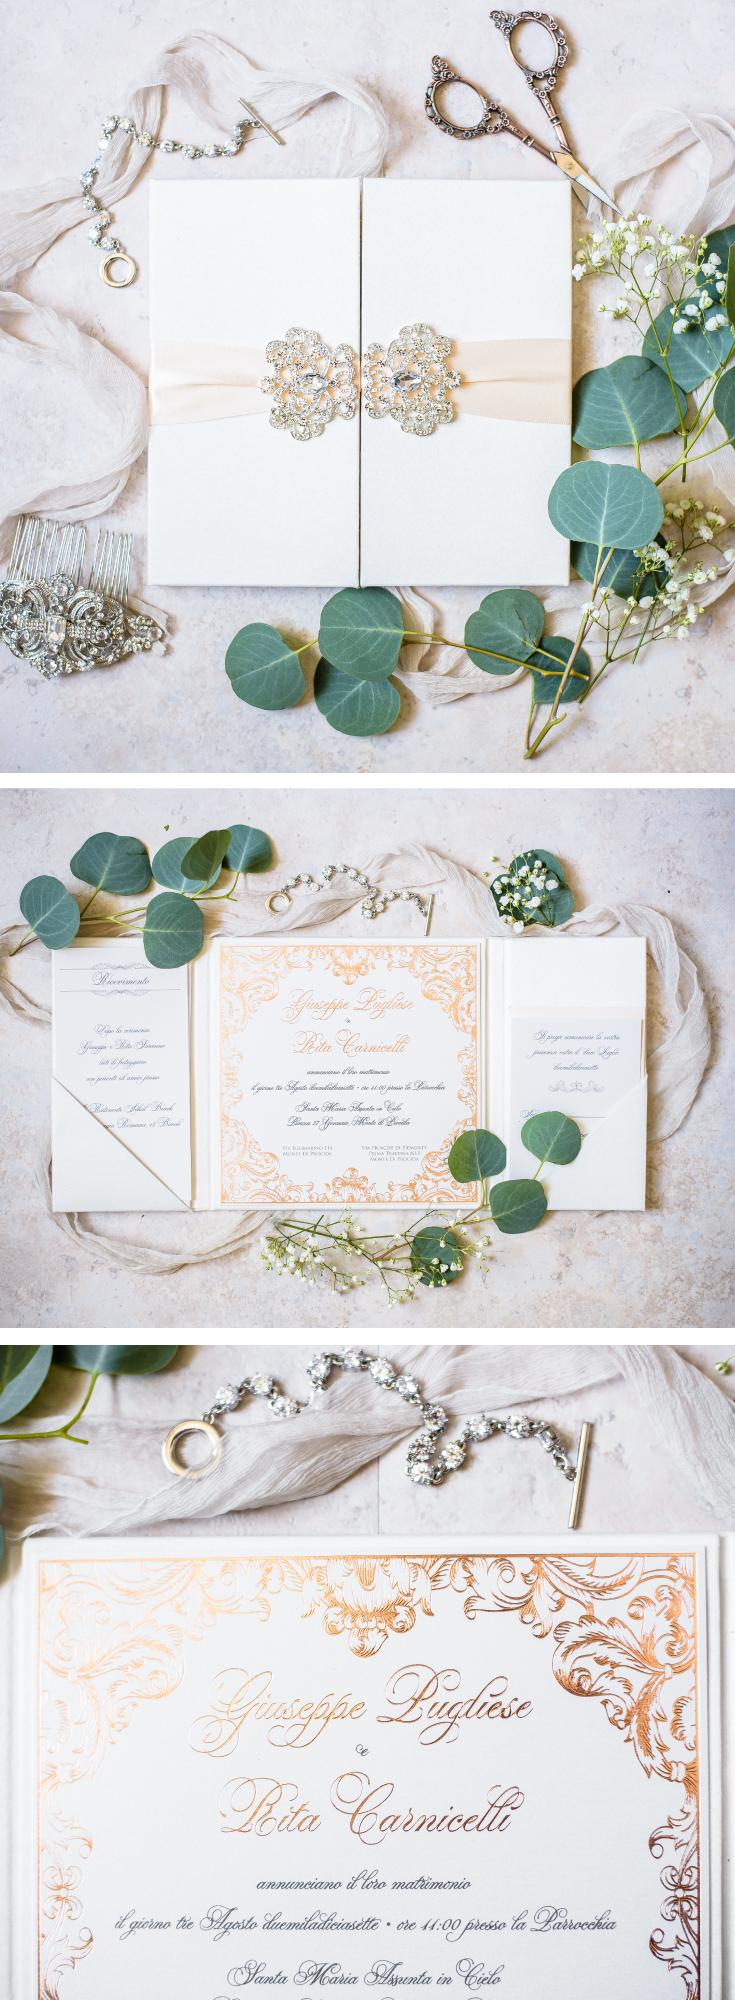 Home | Whimsical wedding invitations, Whimsical wedding and ...